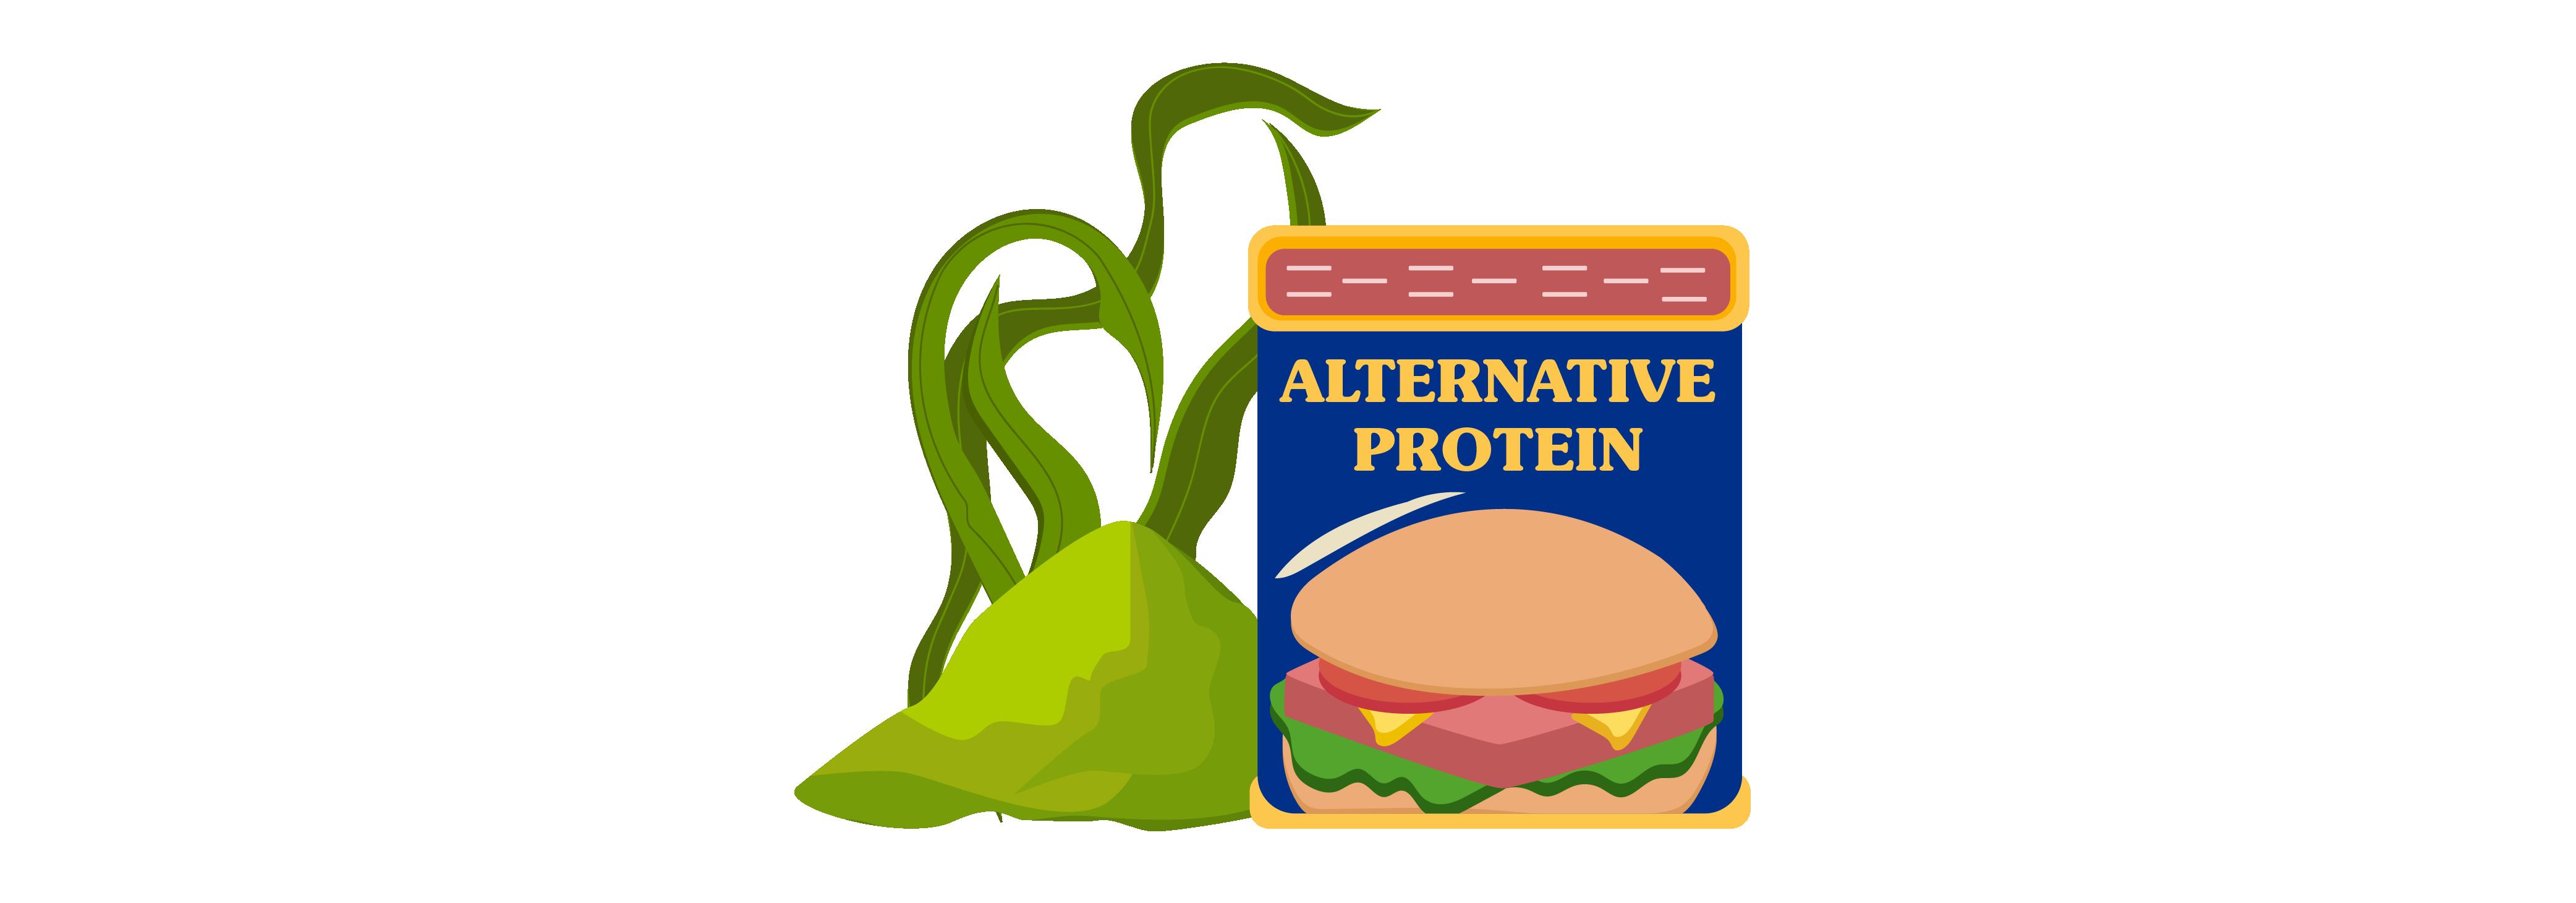 Food Innovation - Alternative Protein